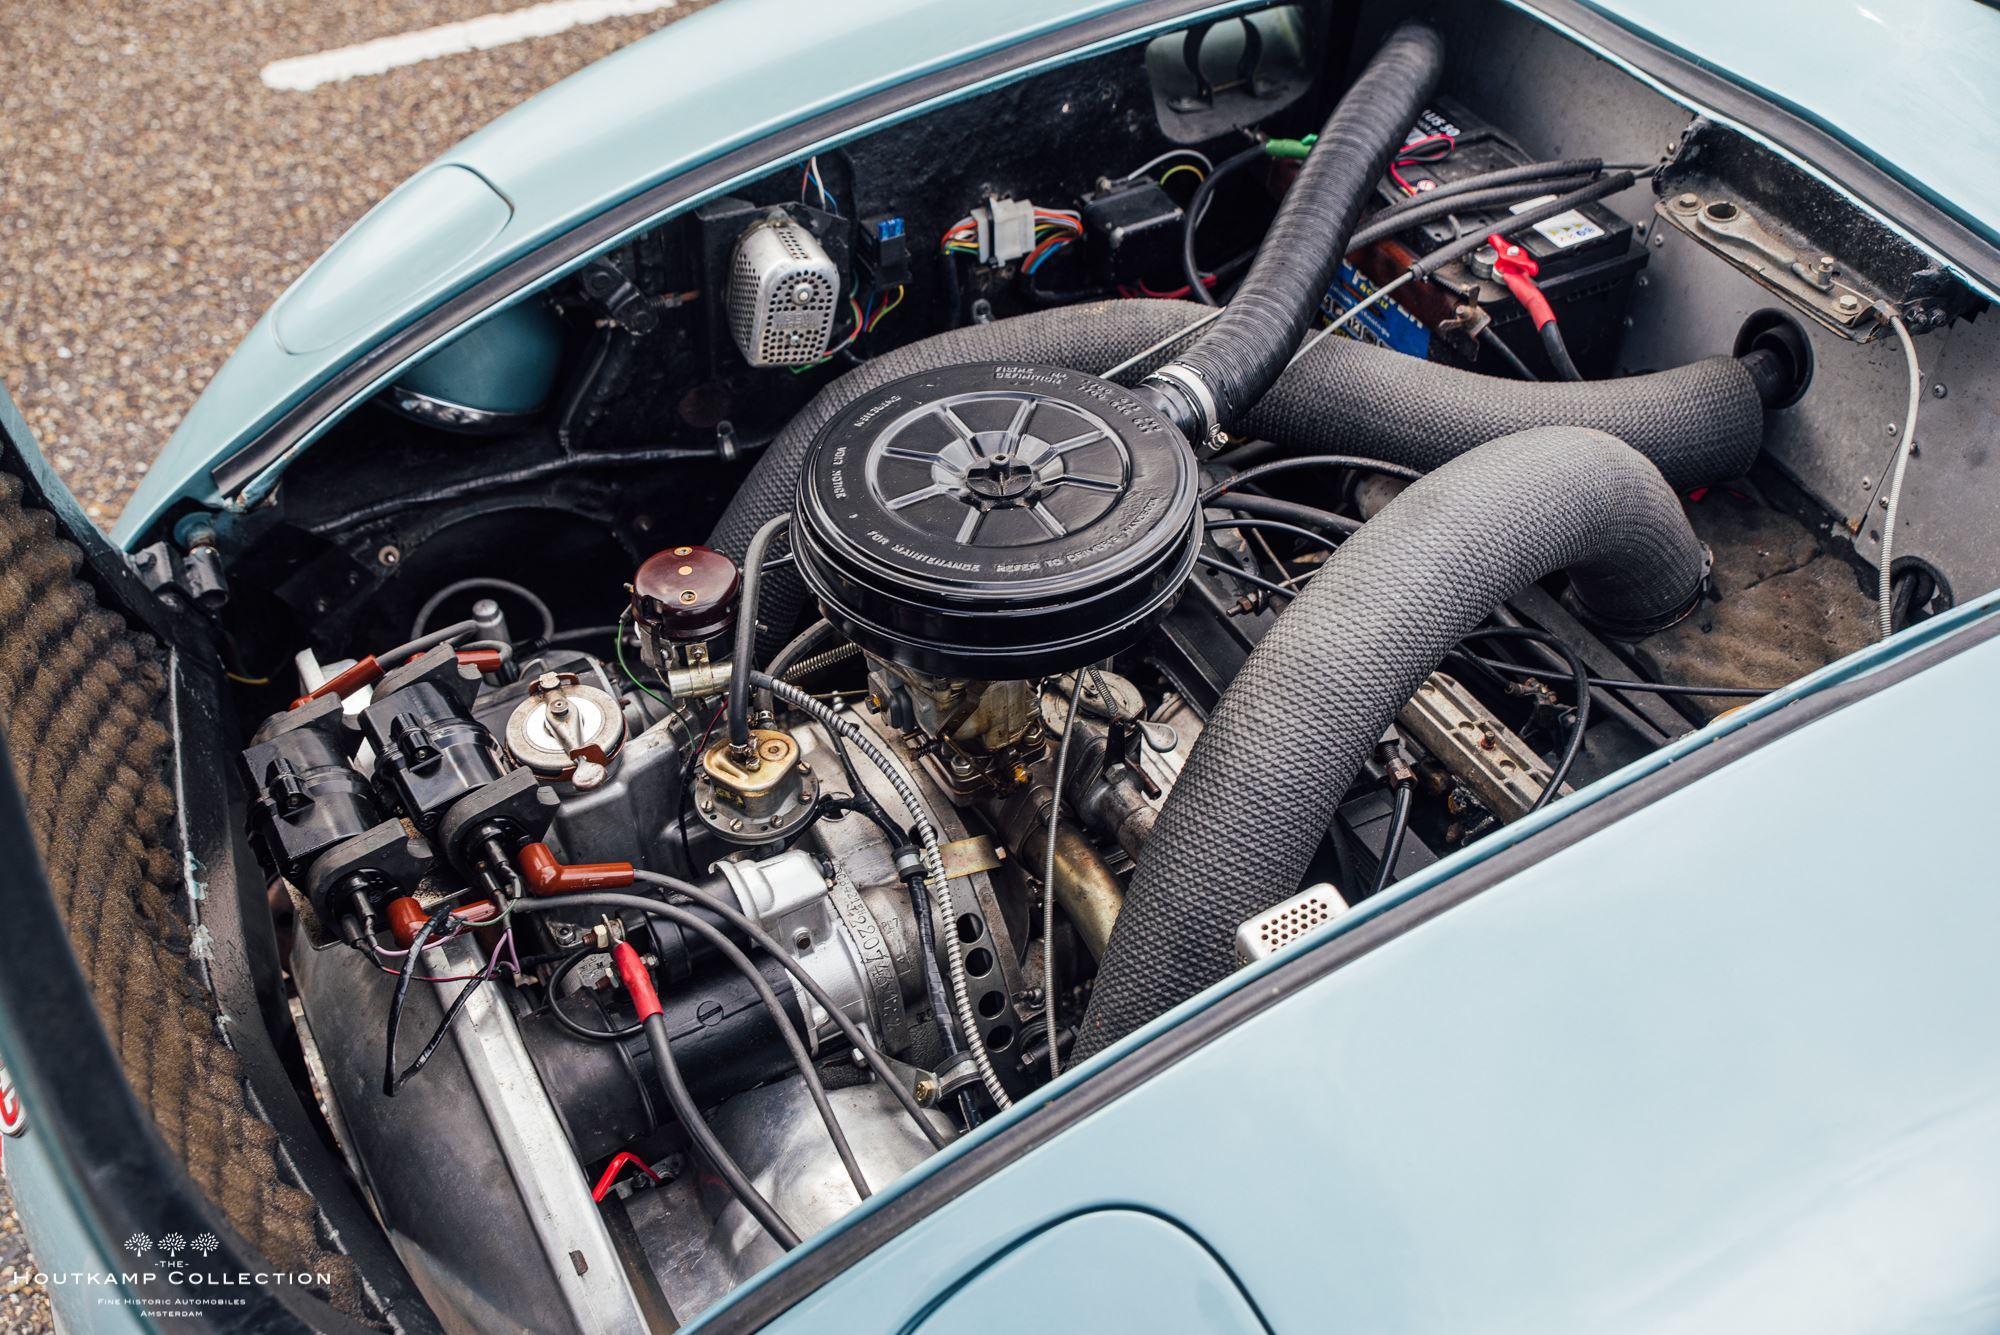 1956-DB-HBR-5-Race-car-Mille-Miglia-1957-(15)